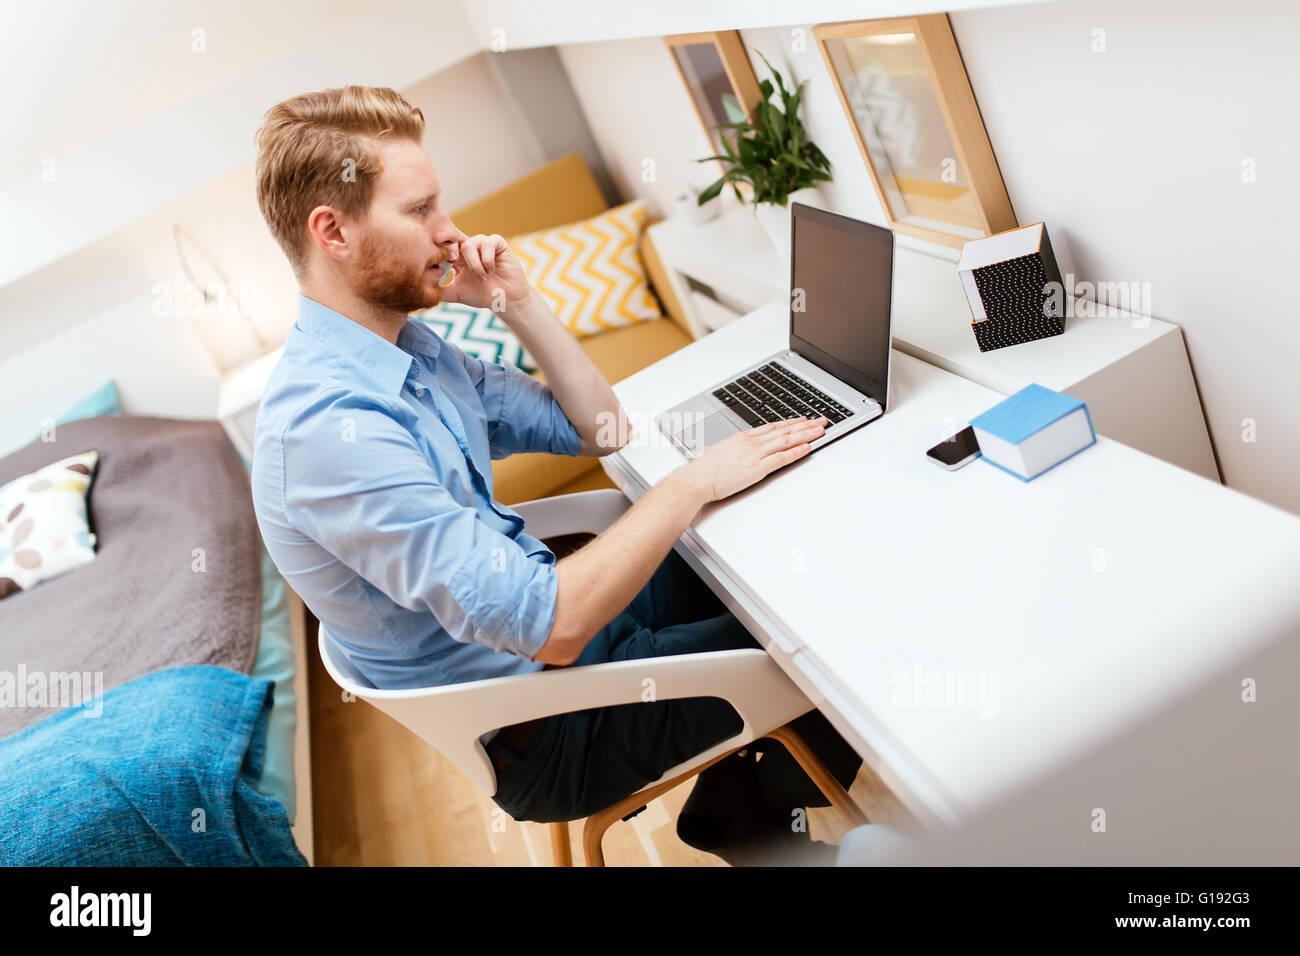 telework stockfotos telework bilder alamy. Black Bedroom Furniture Sets. Home Design Ideas